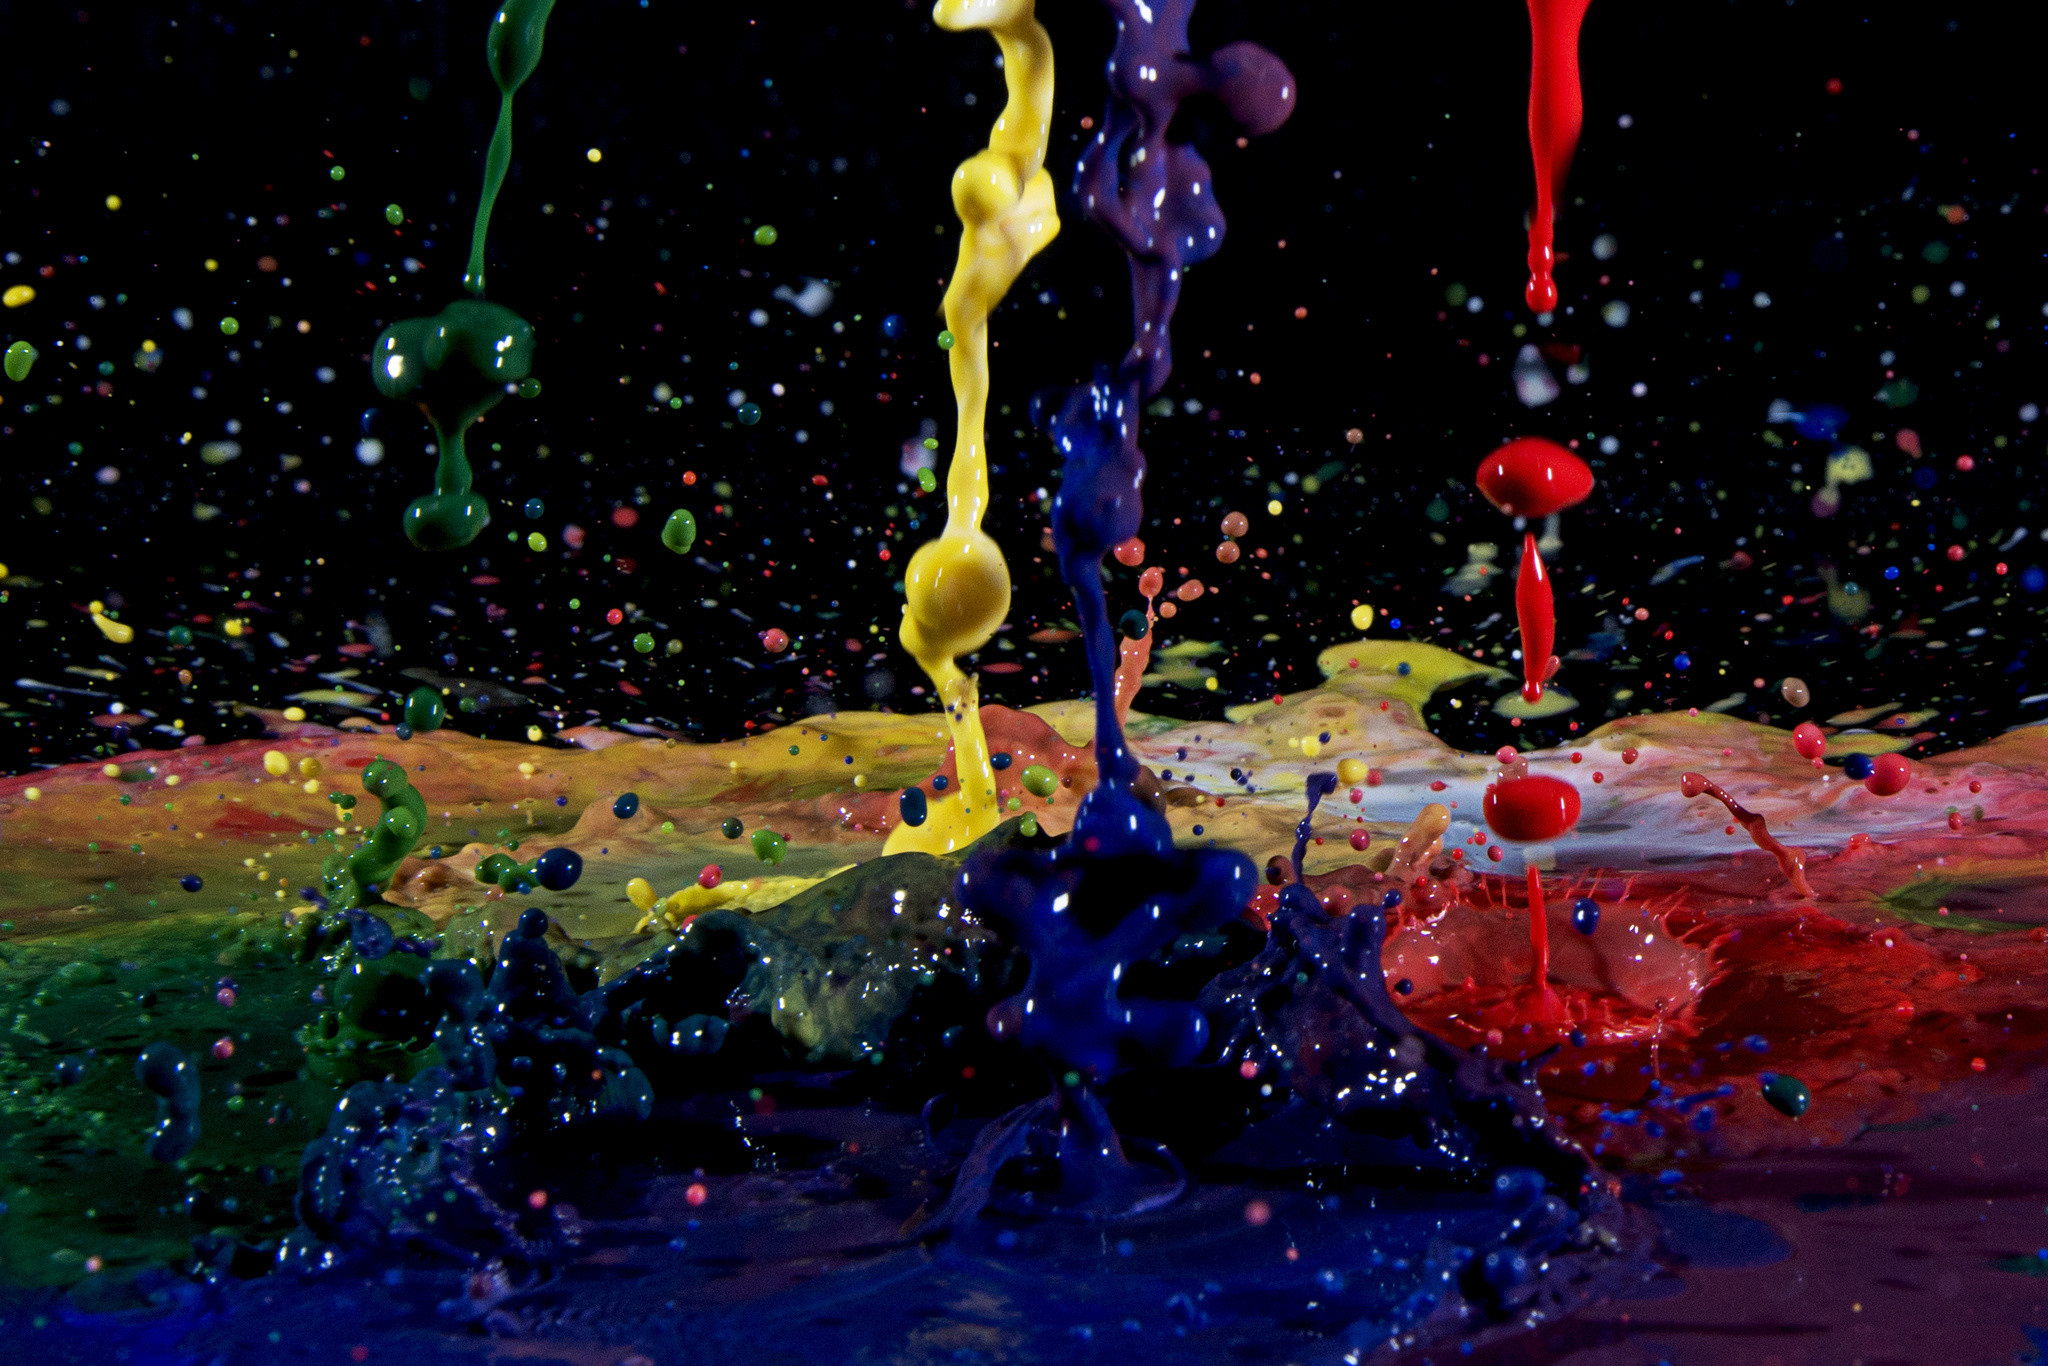 1920x1080 Splash Colors Abstract Desktop Wallpaper Hd